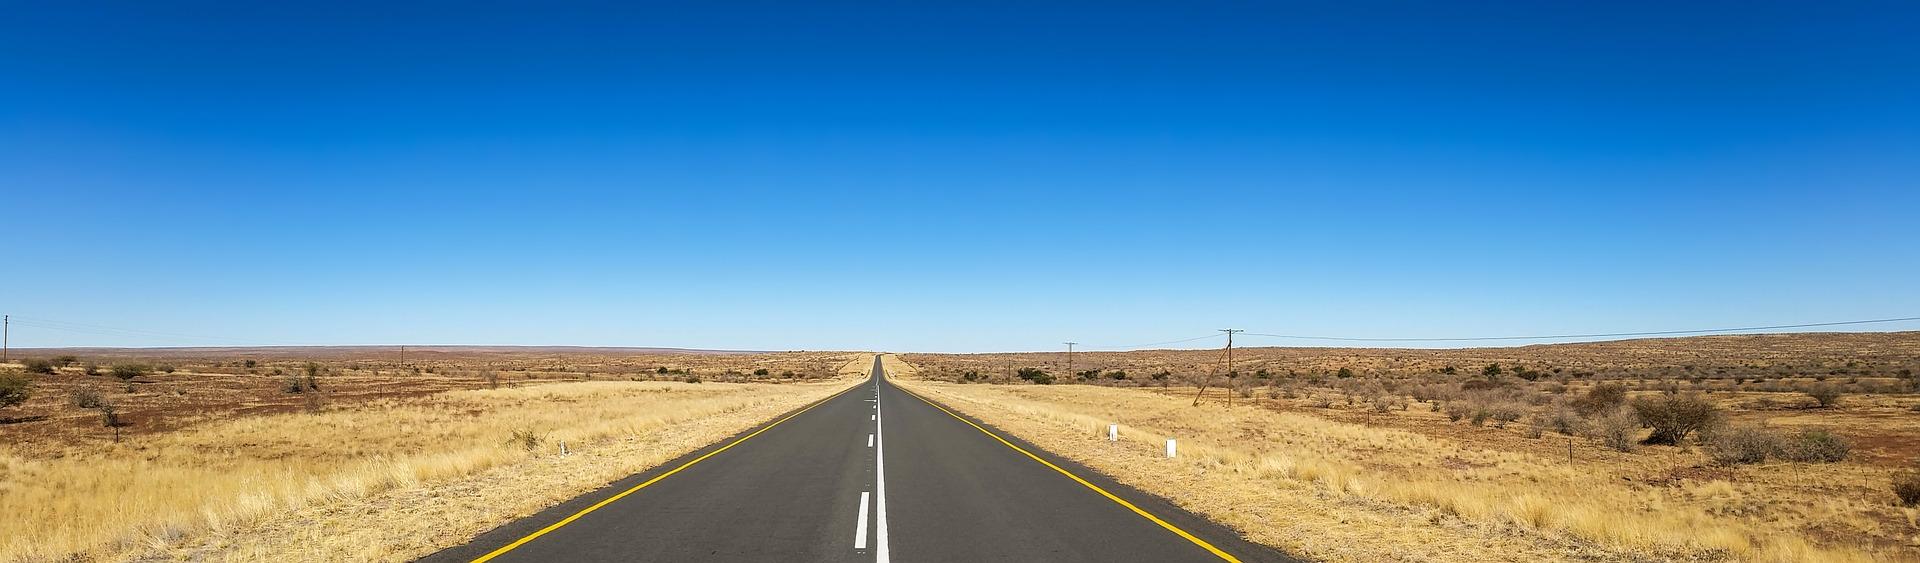 Road in the Namib Desert